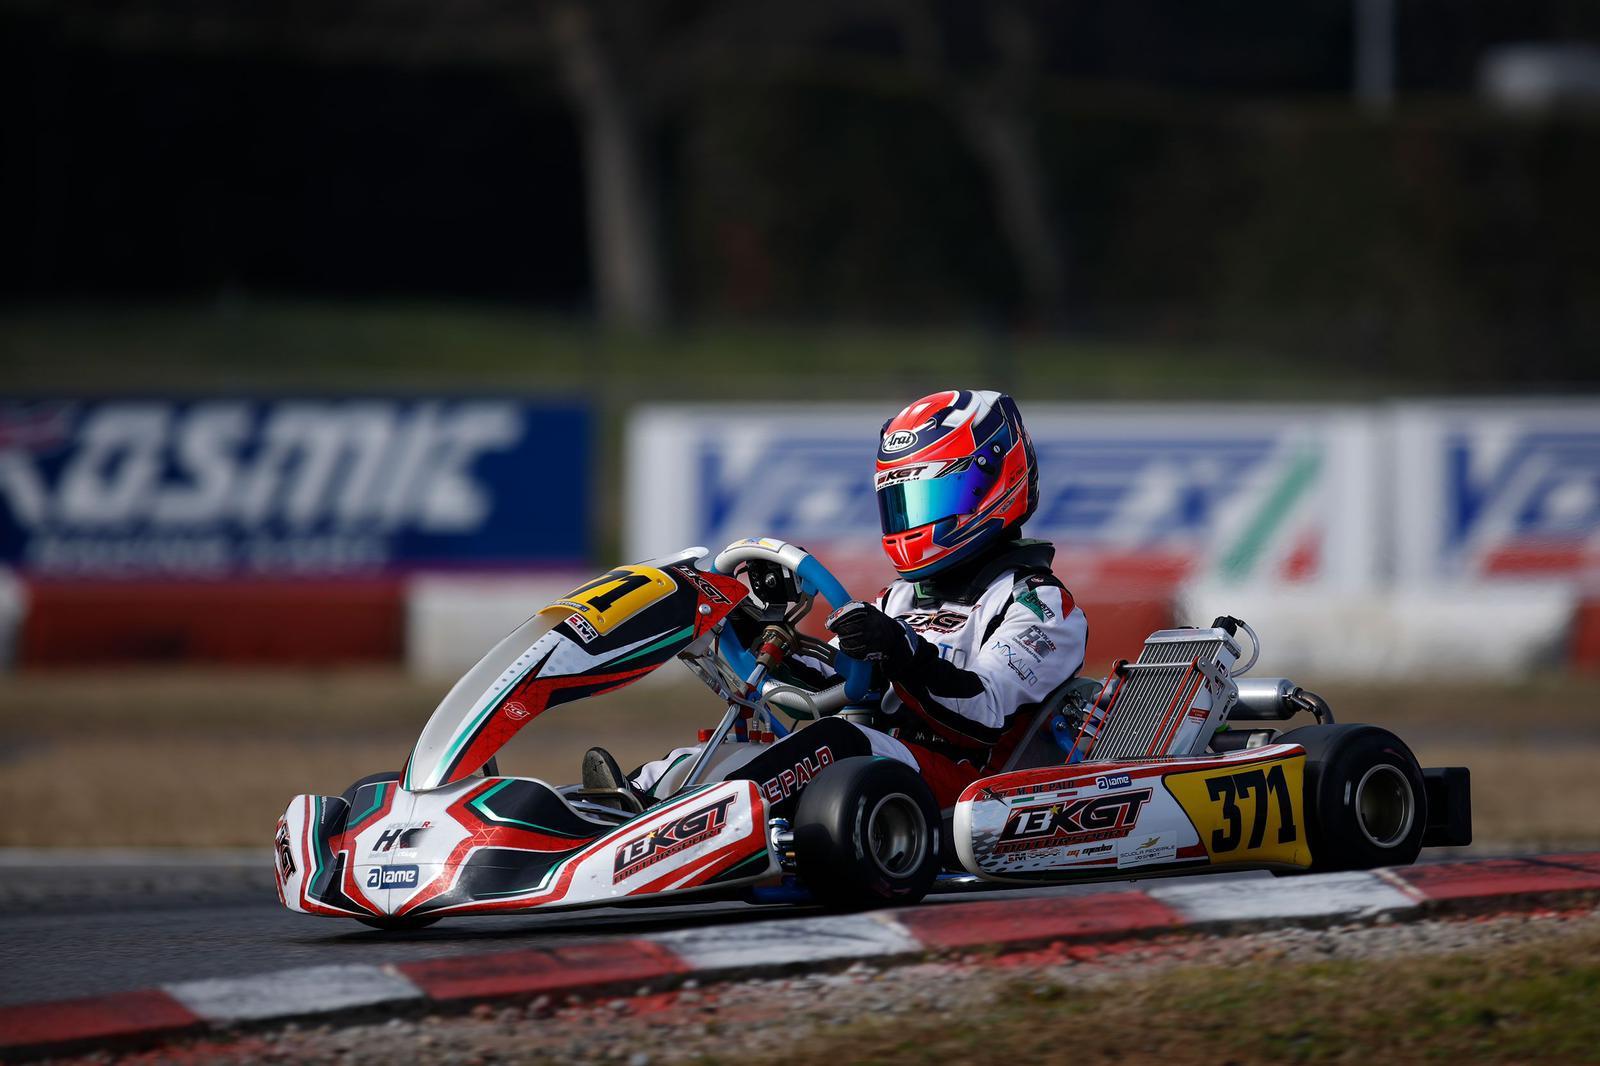 Matteo De Palo, speranza italiana per l'Academy Trophy